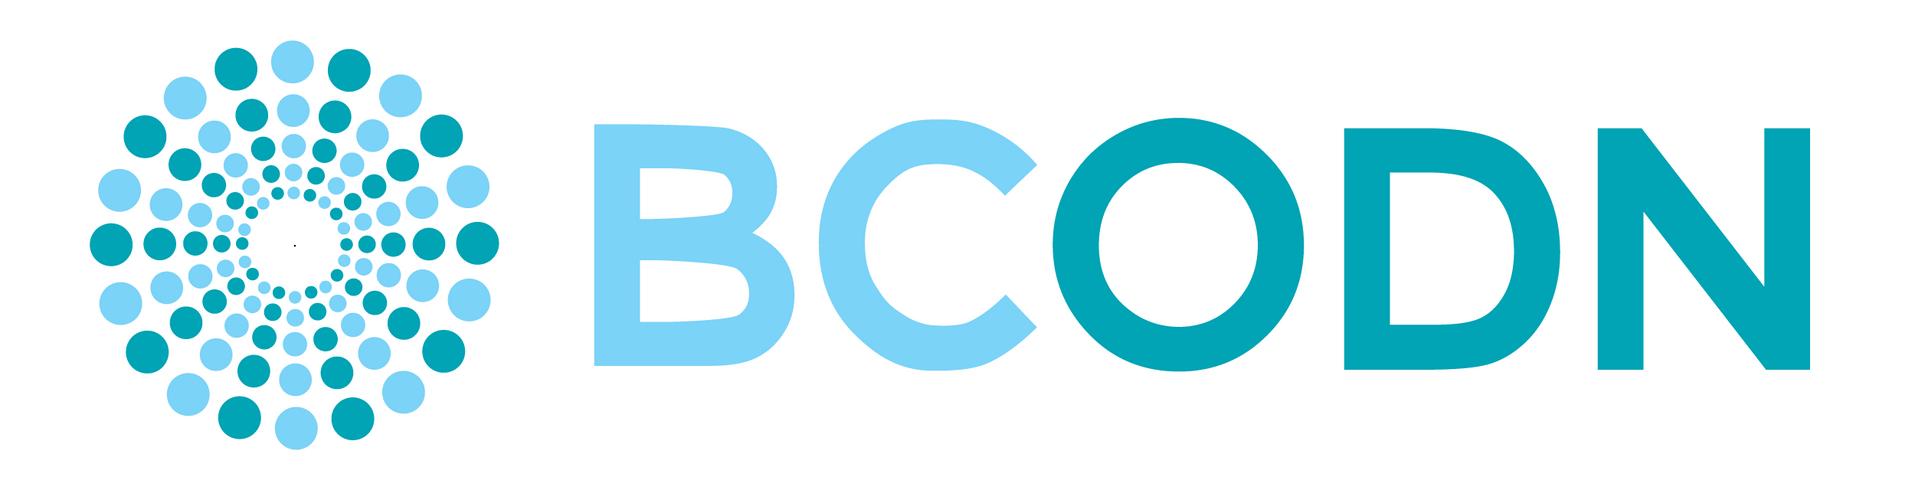 BCODN-logo-white.png